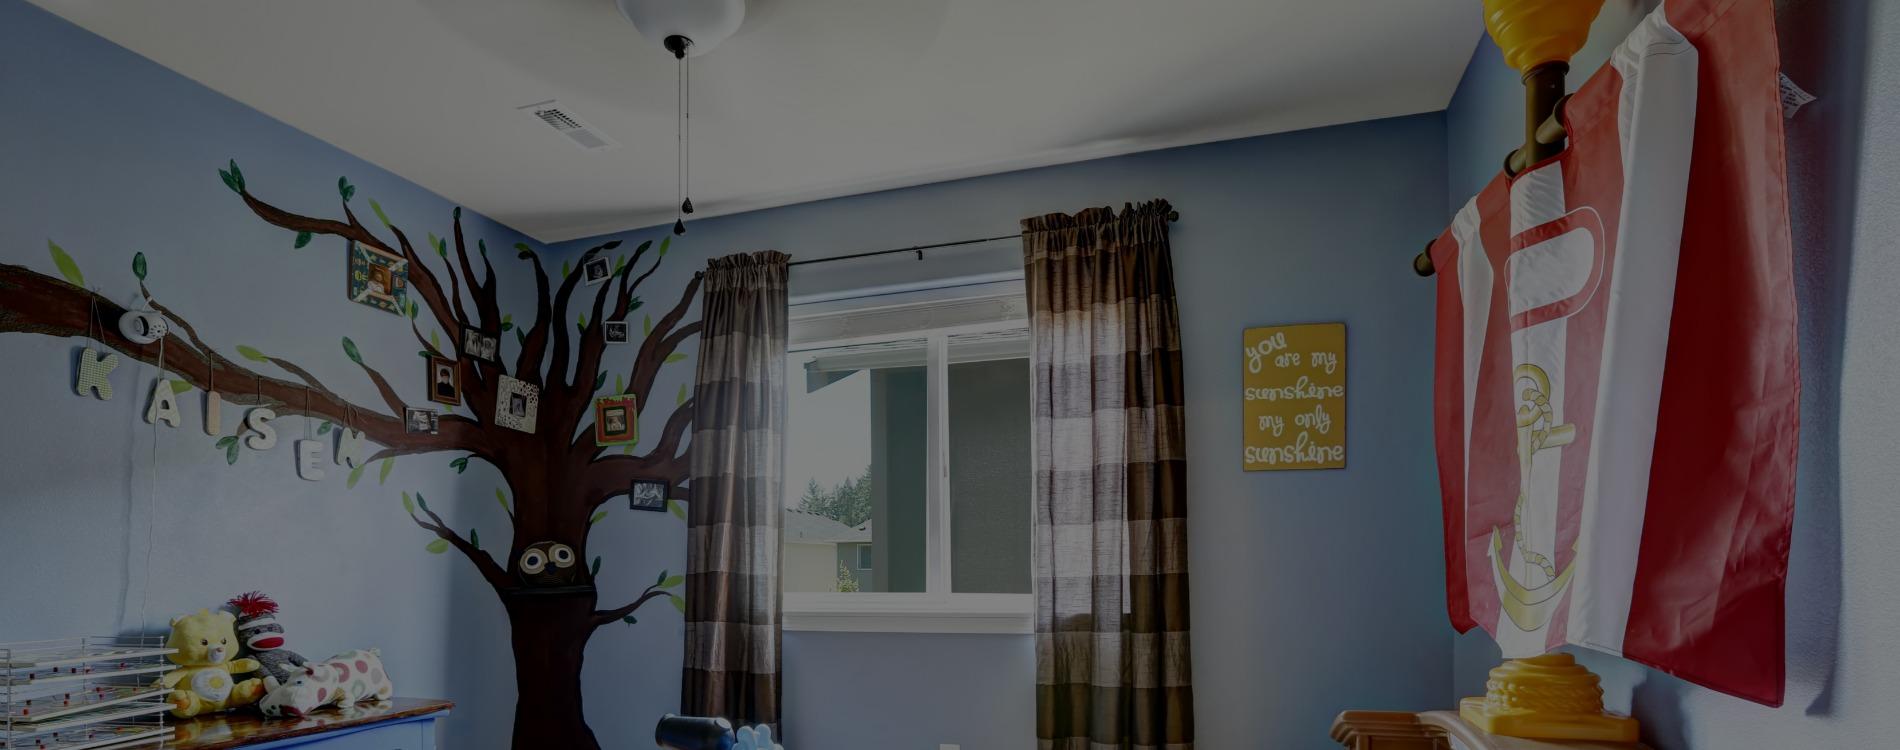 Balancing Your Kids and Your Career as an Interior Decorator